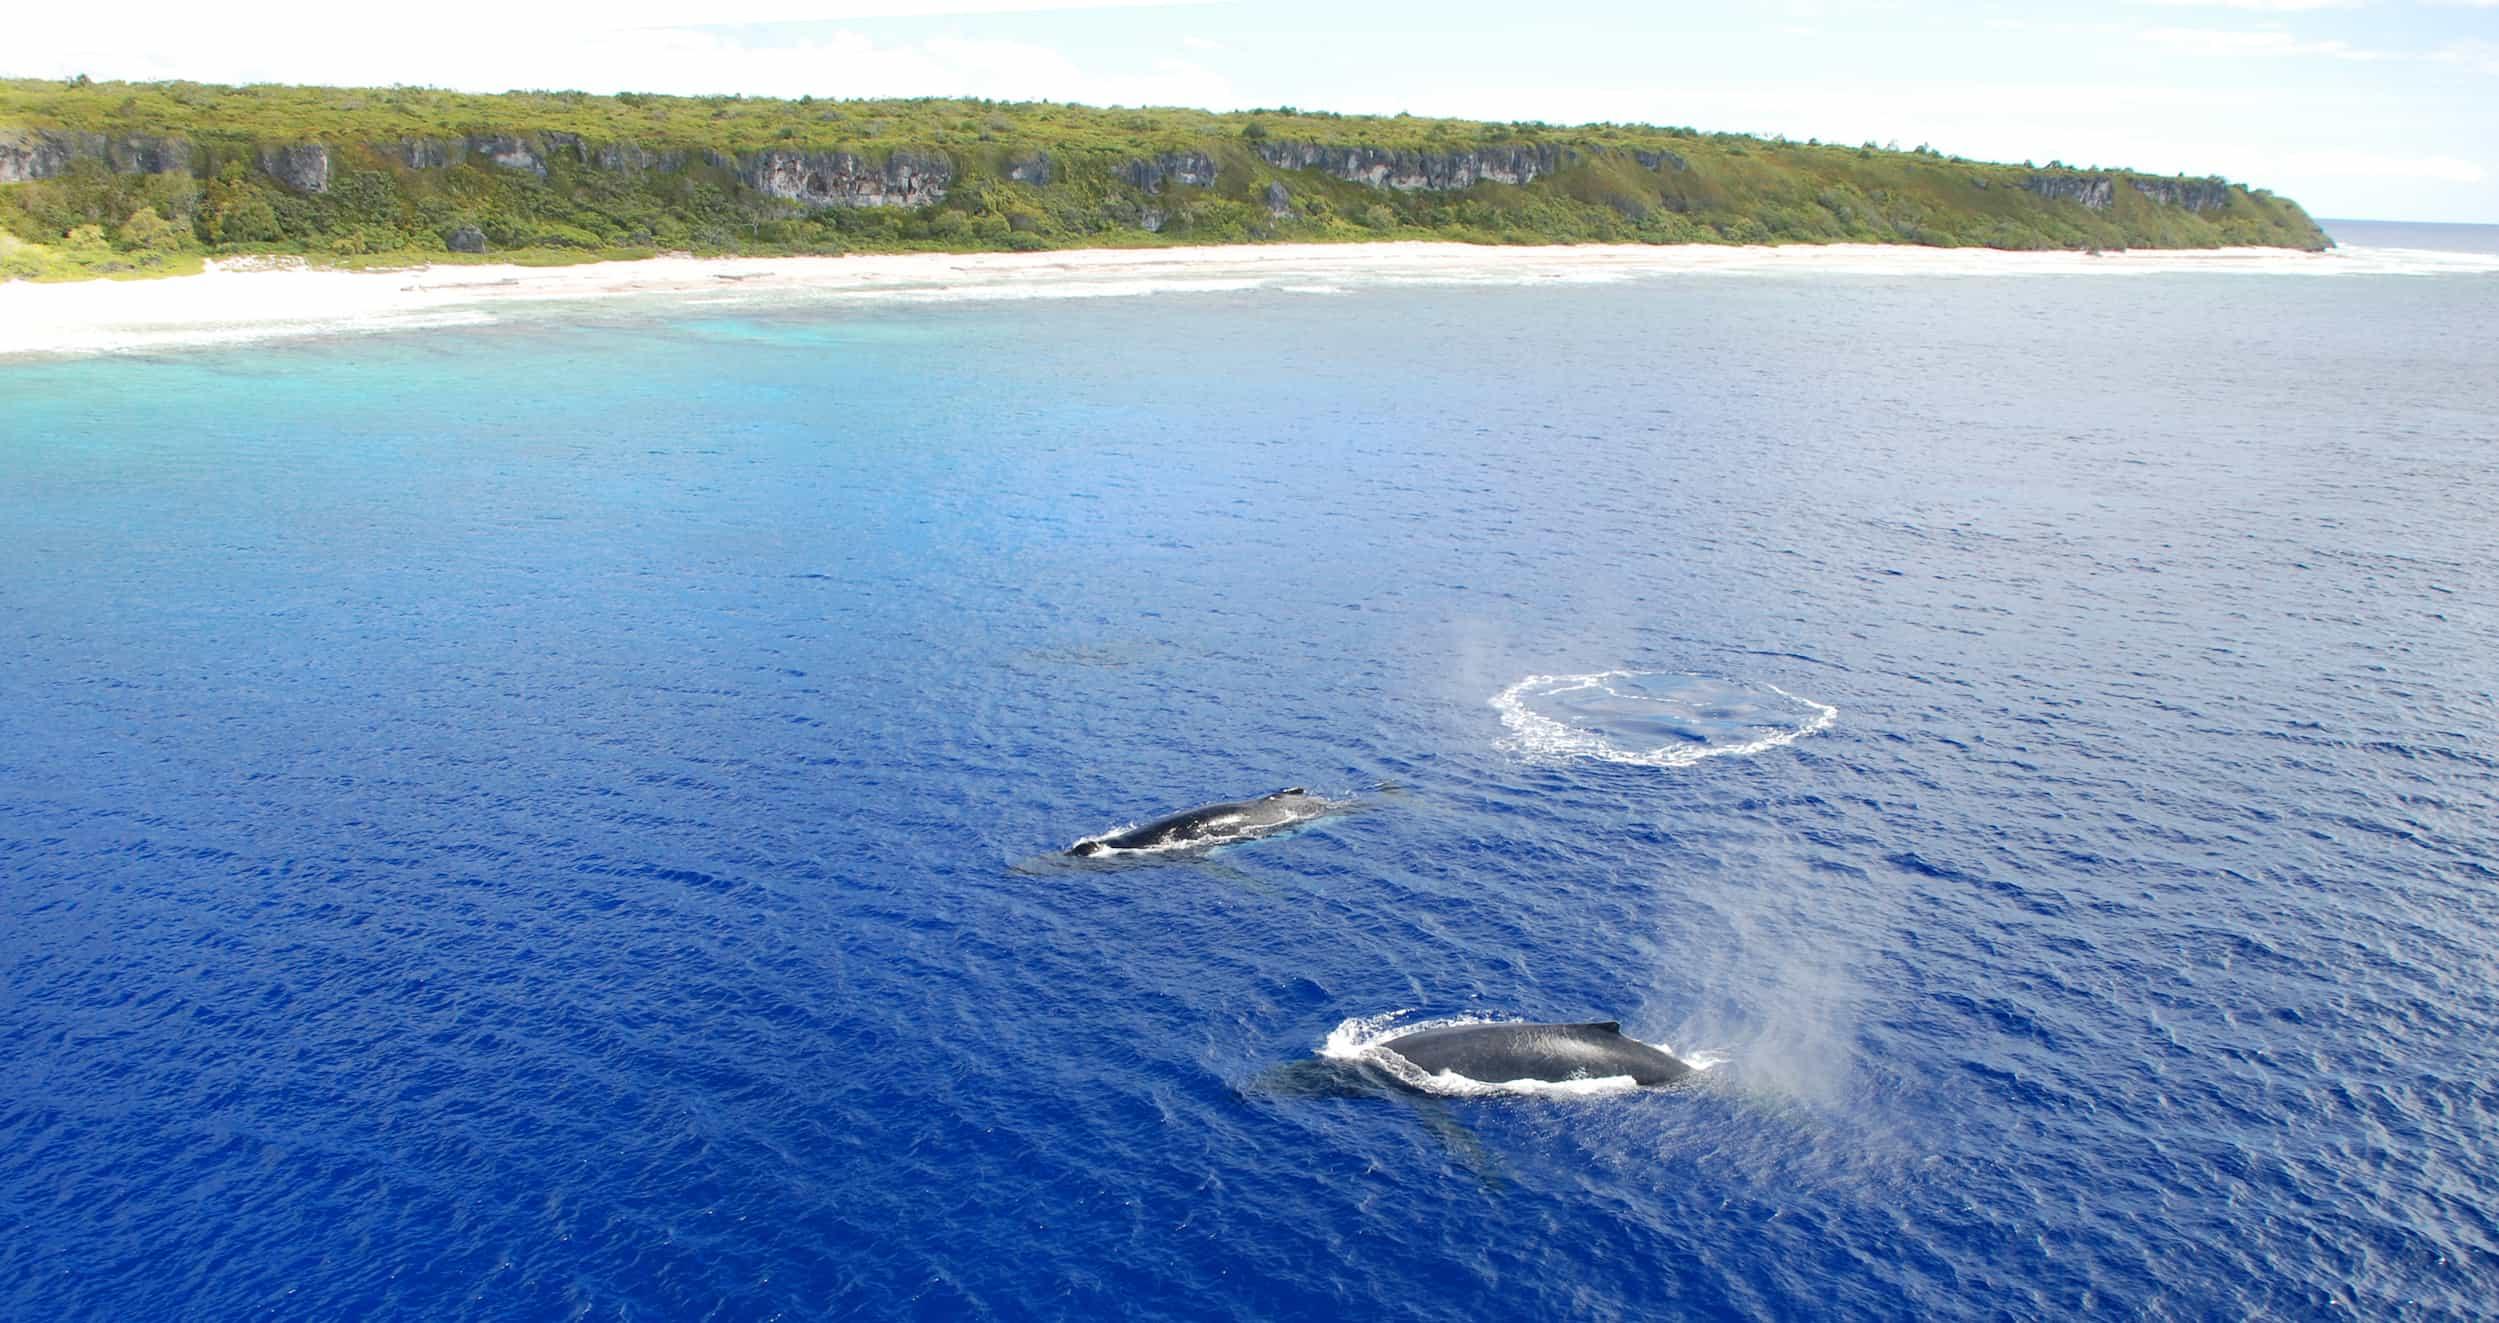 Humpback Whales close to Henderson Island. Photo: Steve Darroch